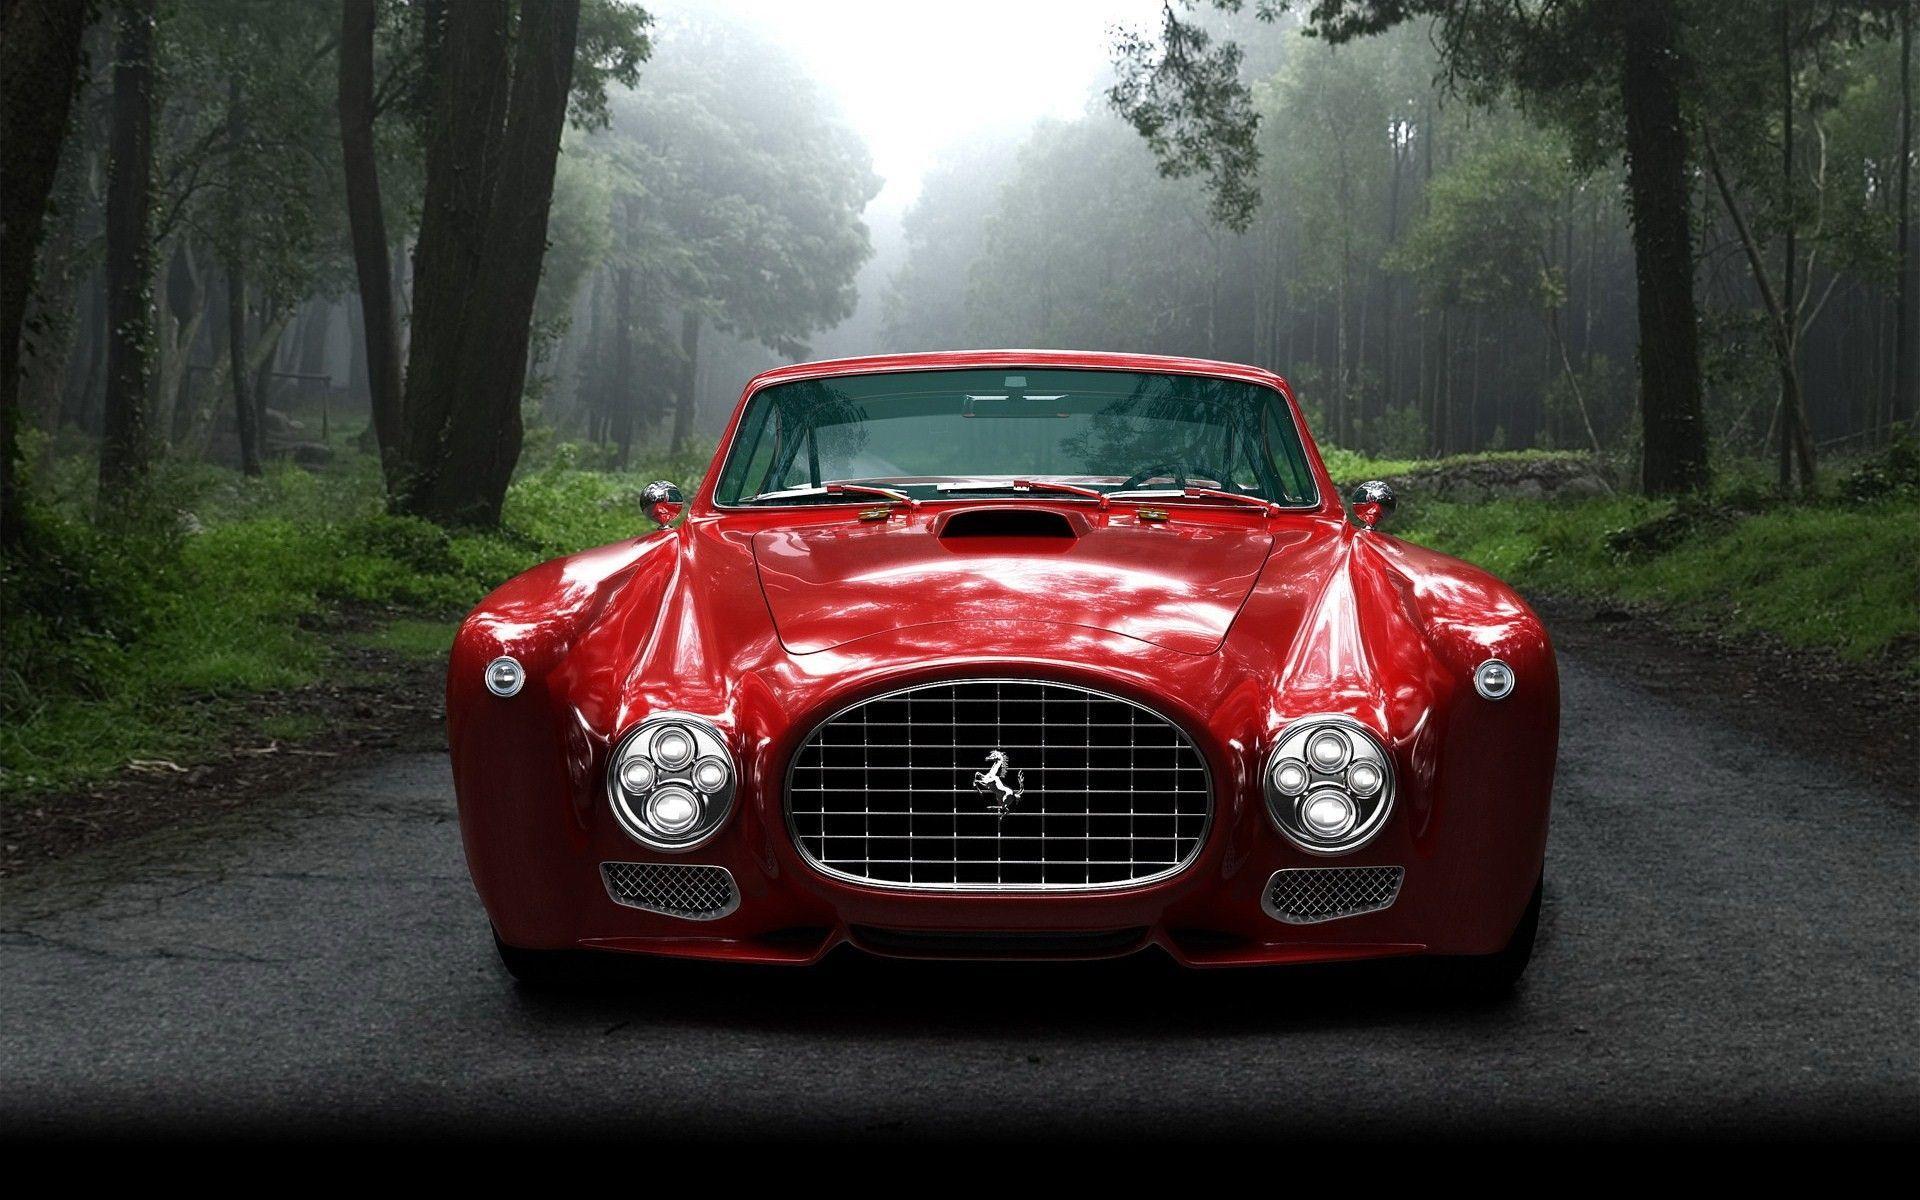 Vintage Ferrari Wallpapers Top Free Vintage Ferrari Backgrounds Wallpaperaccess